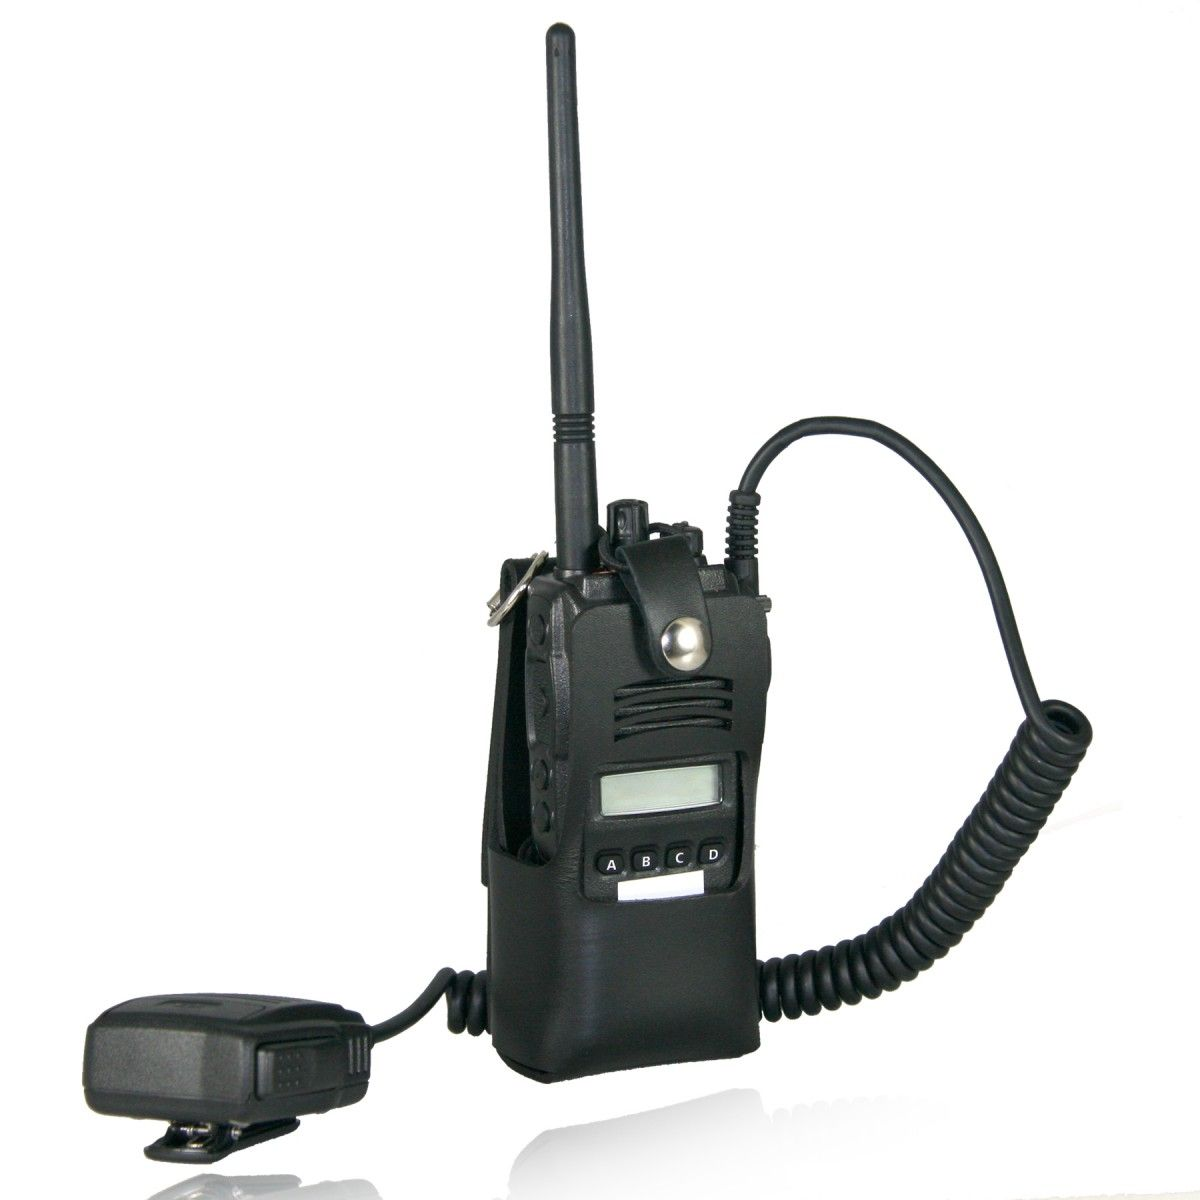 Radio holder motorola apx 6000 - Firefighter S Radio Holder For Vertex Standard Vx 924